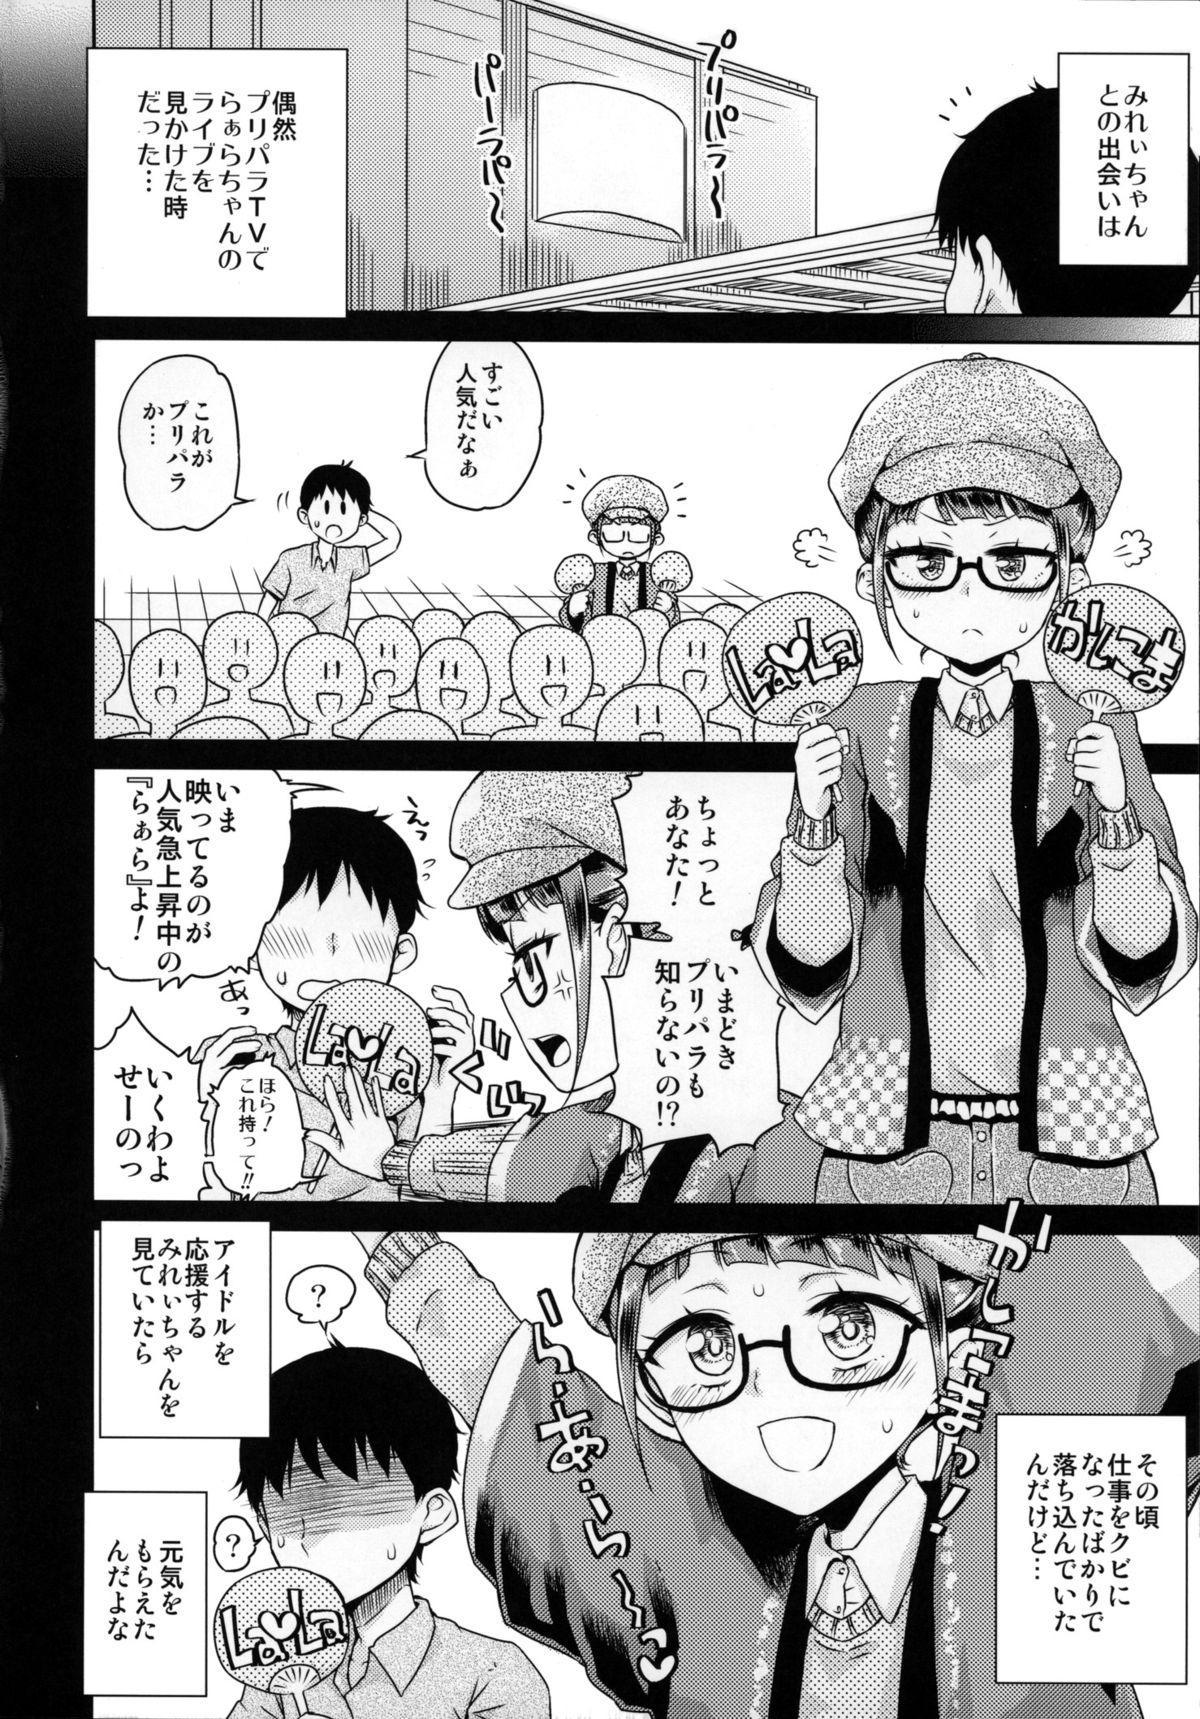 Mirei-chan to Love Love 2